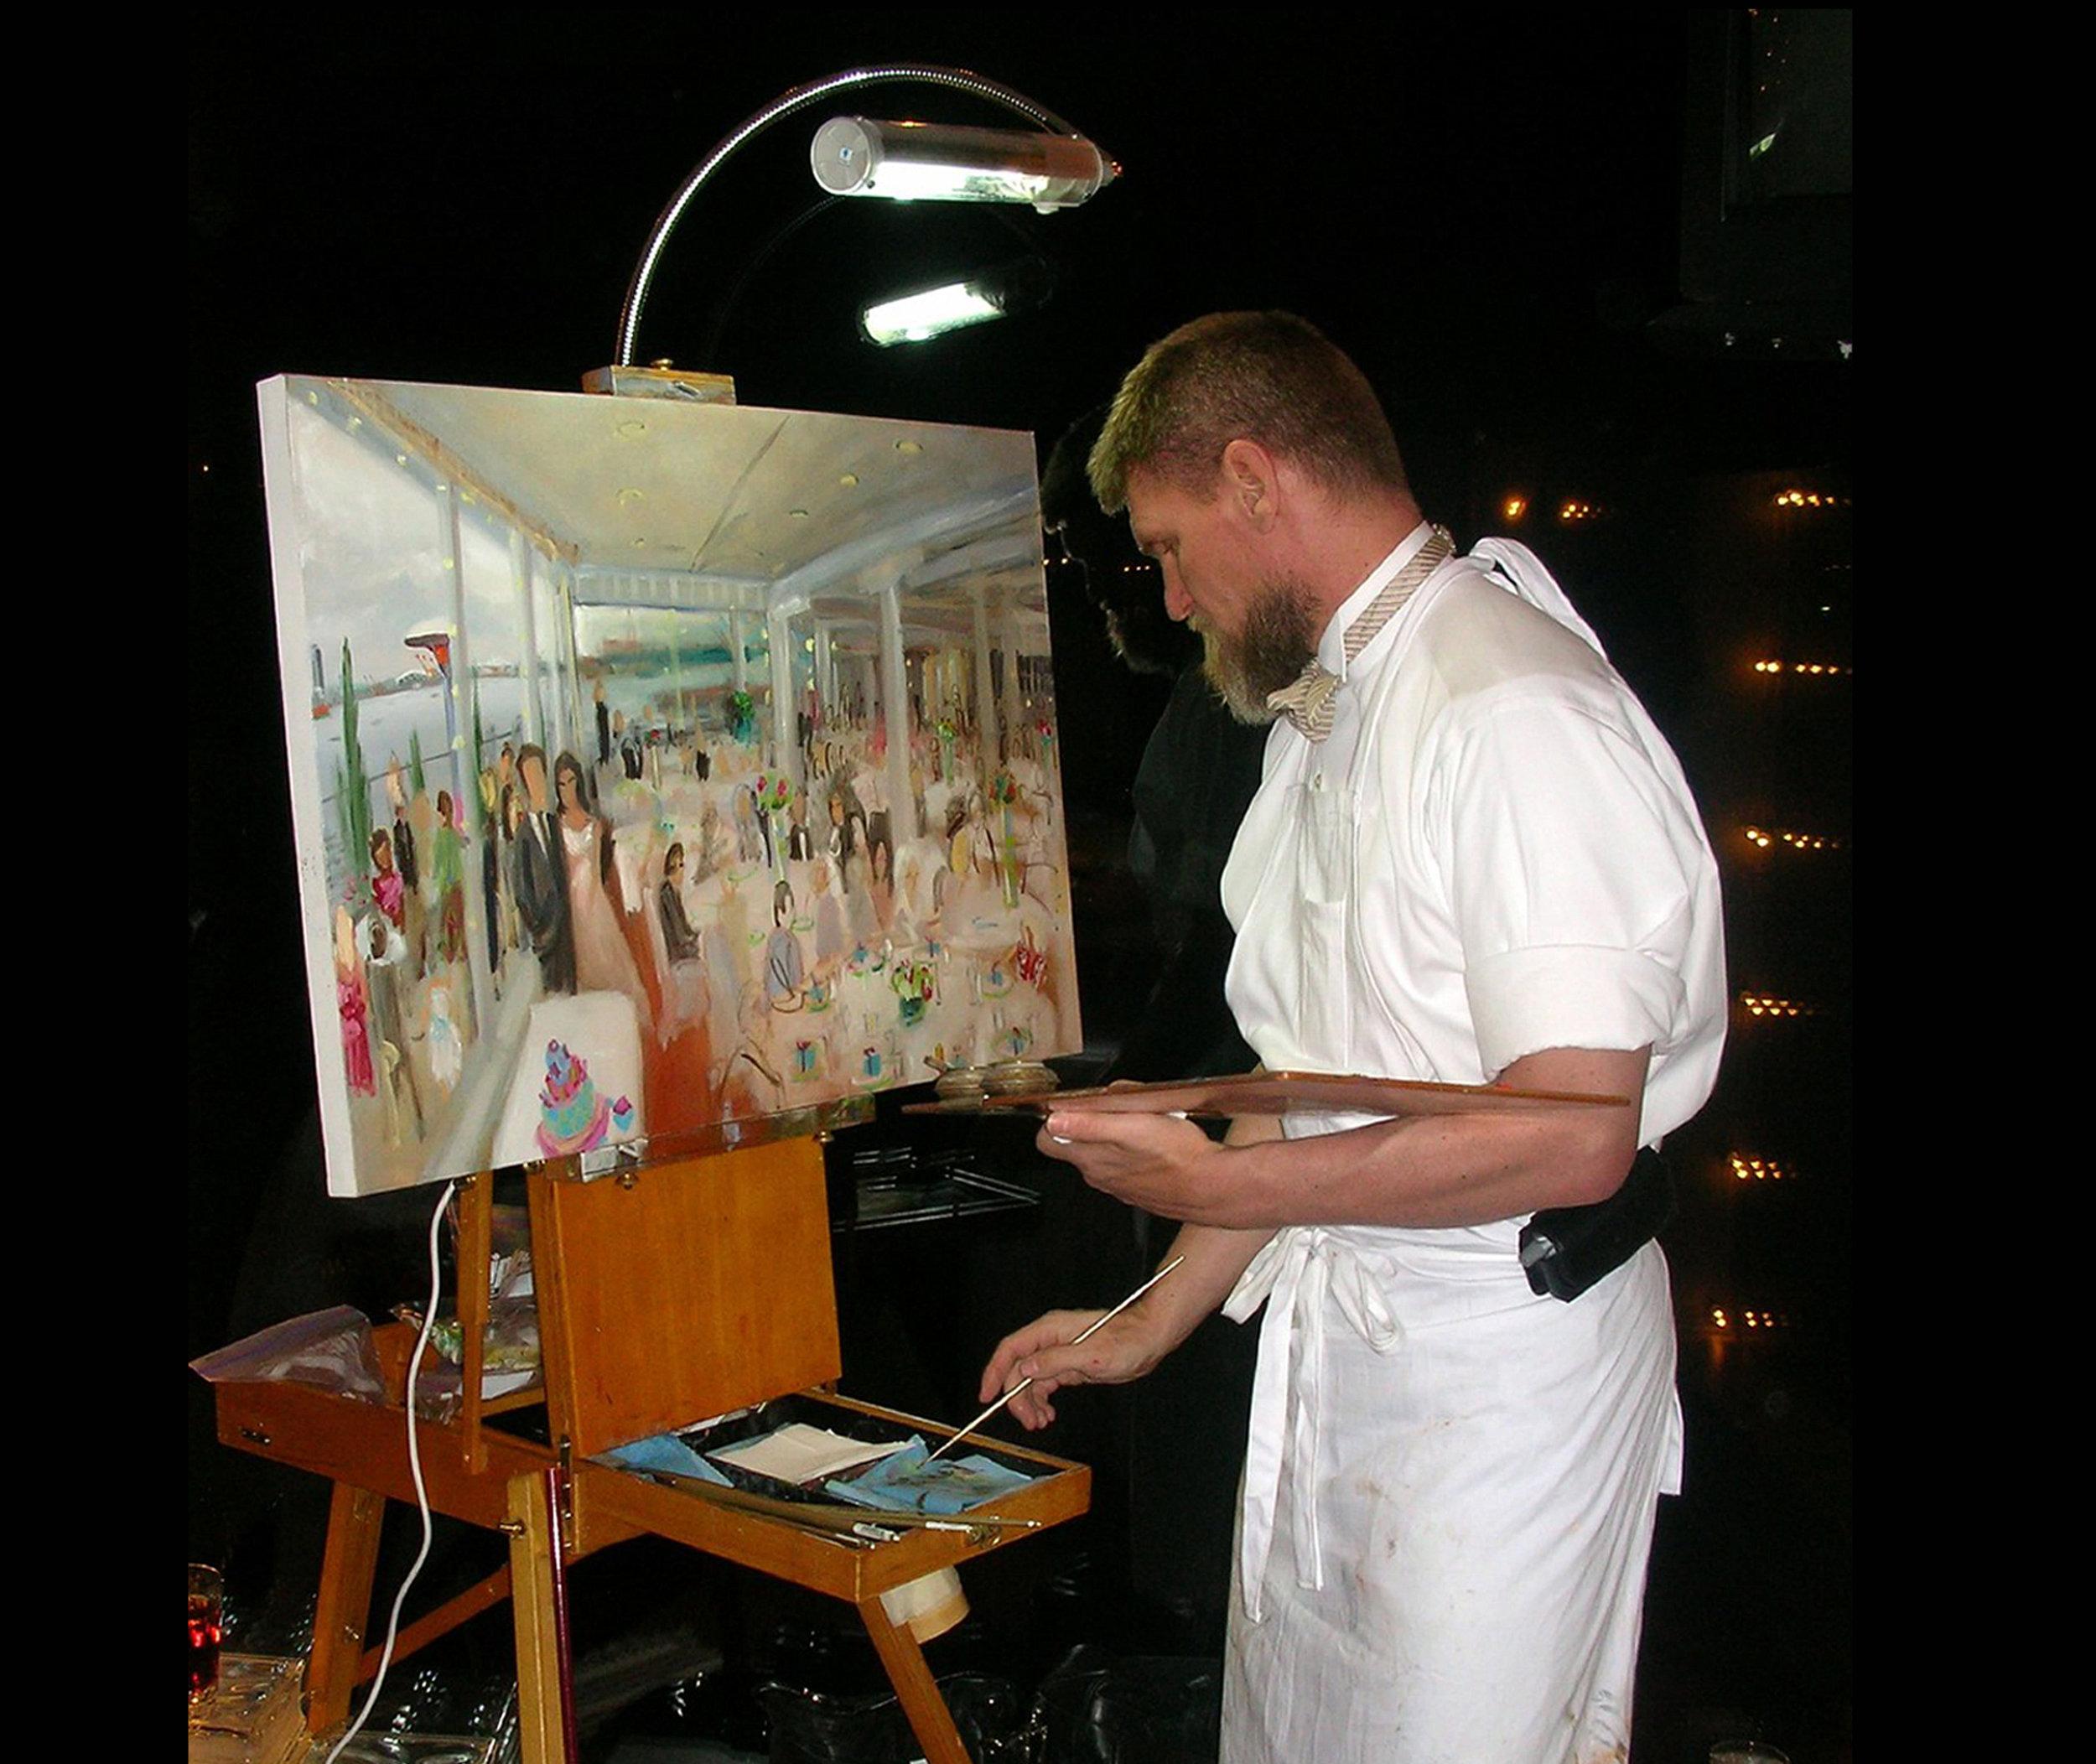 Sam-Day-Wedding-Painter_WiW-19.jpg